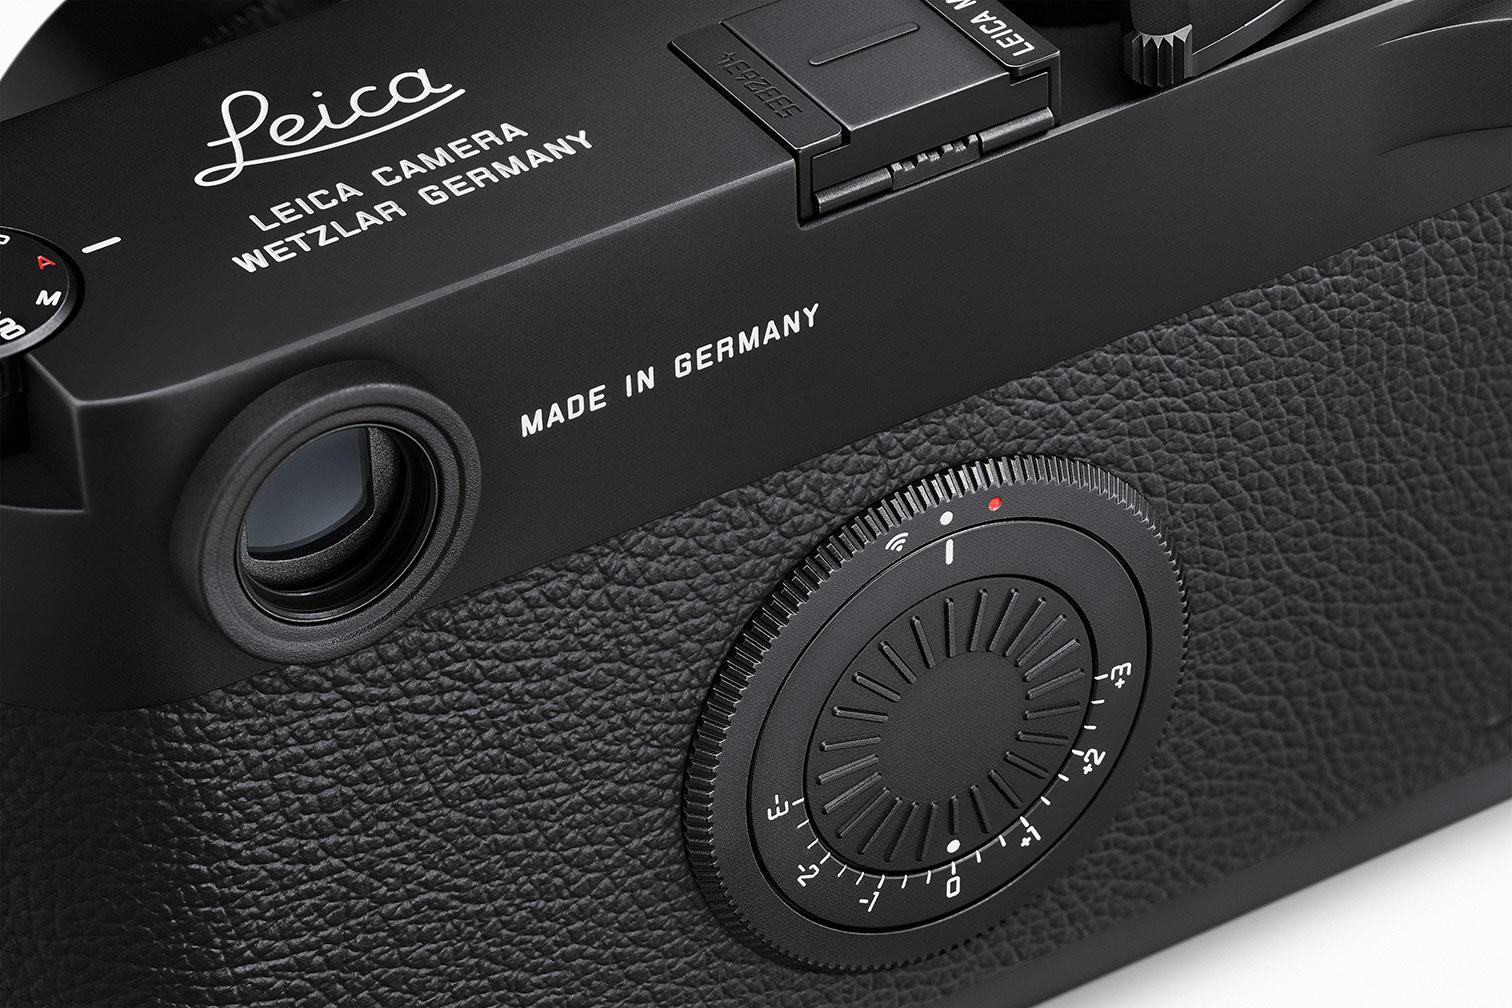 Leica M10-D hands-on video